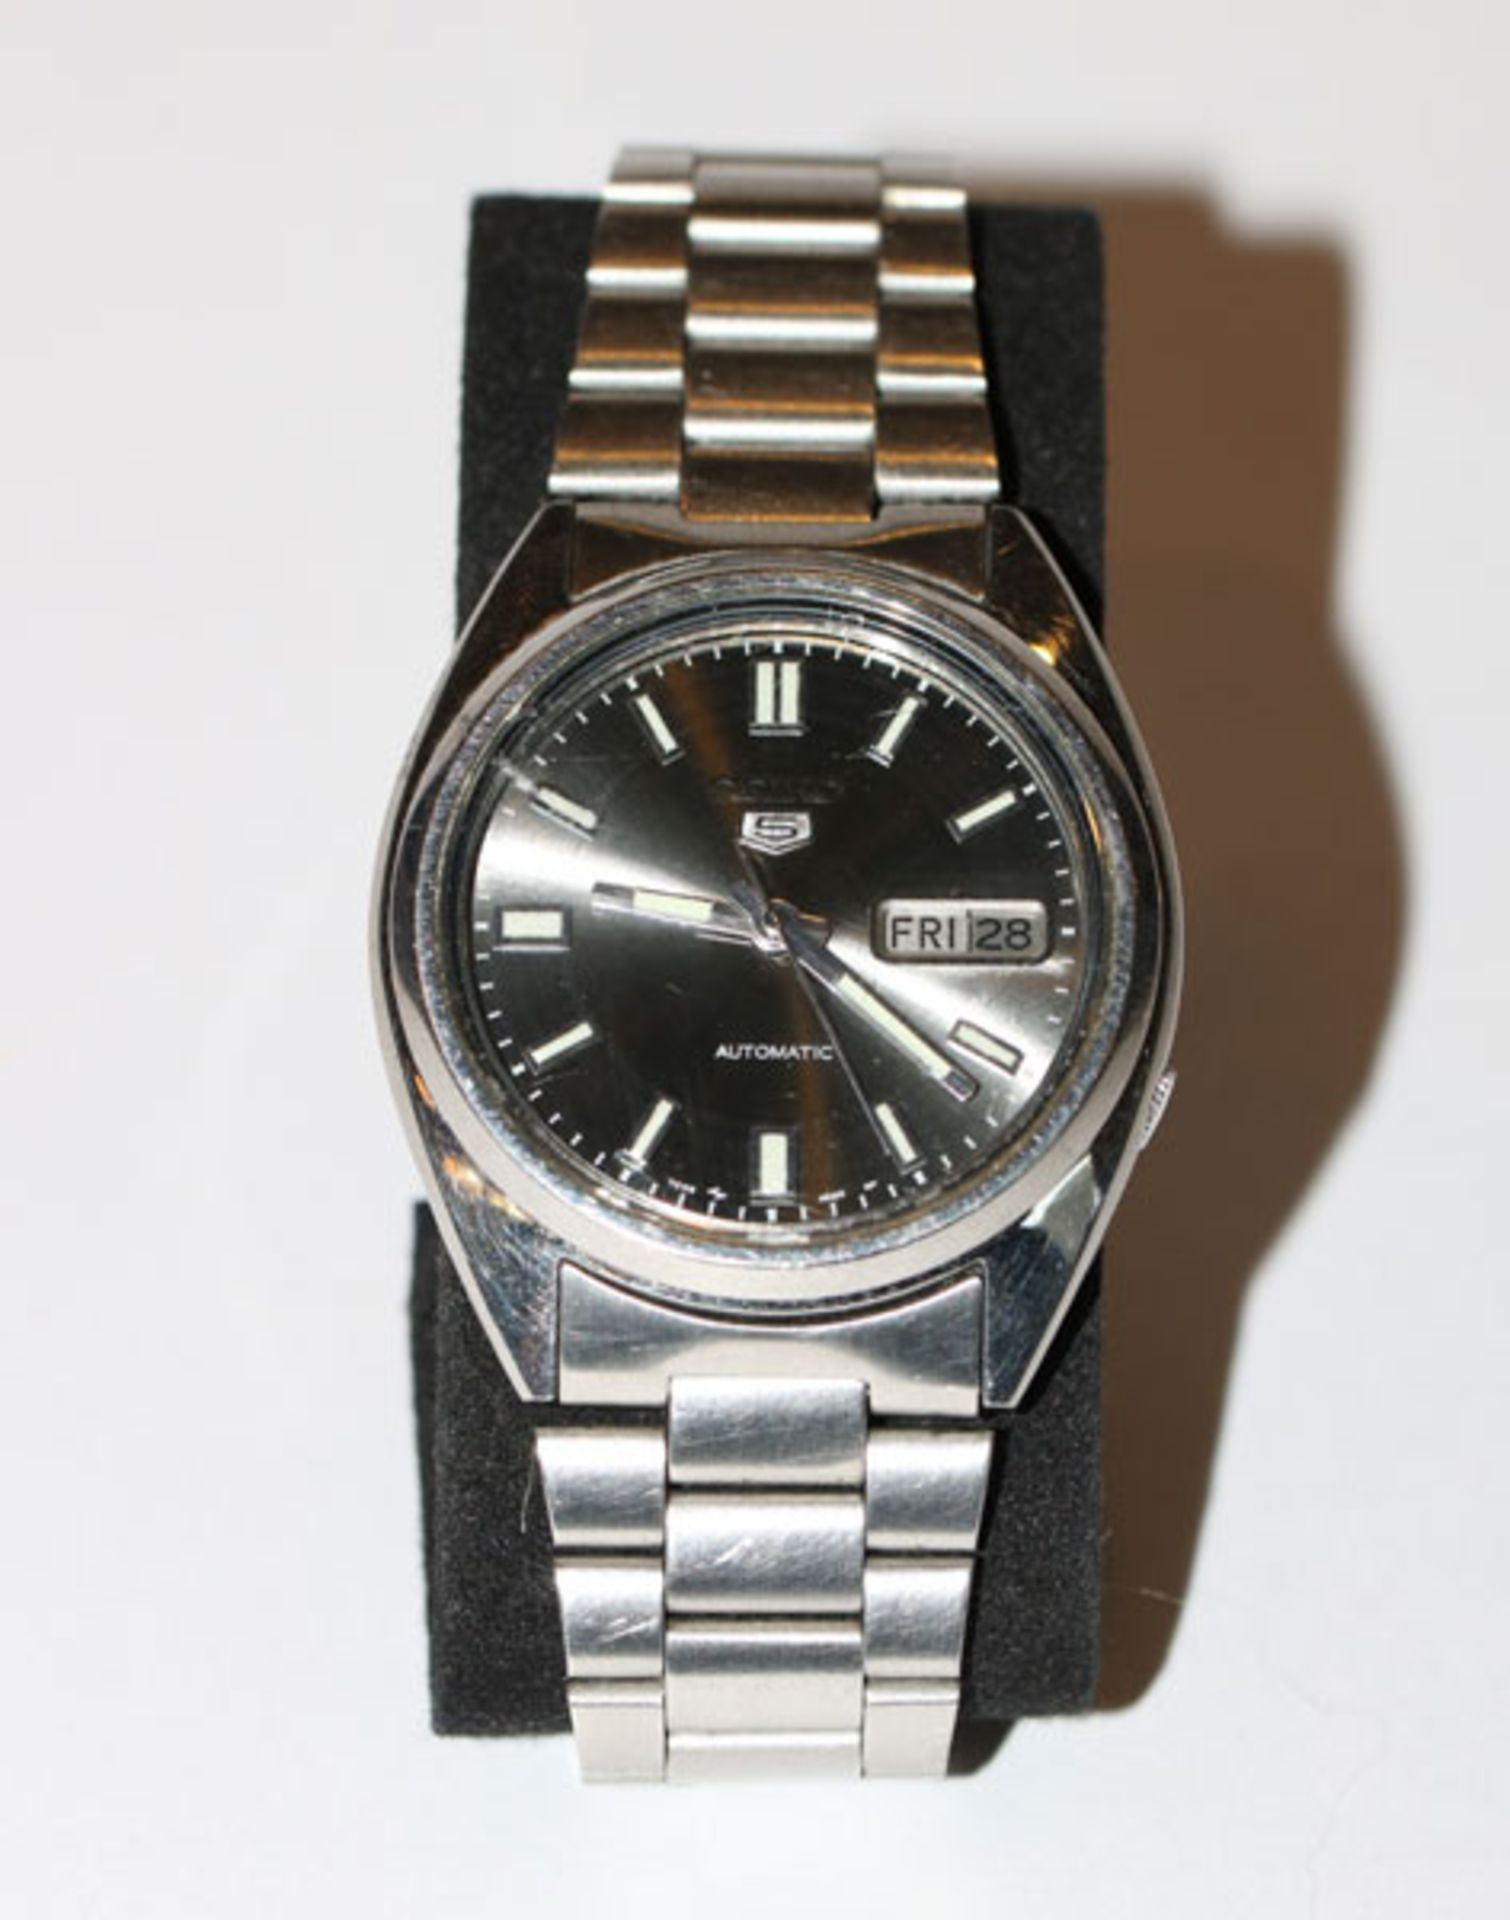 Seiko automatik Herren Stahl Armbanduhr mit Datum, intakt